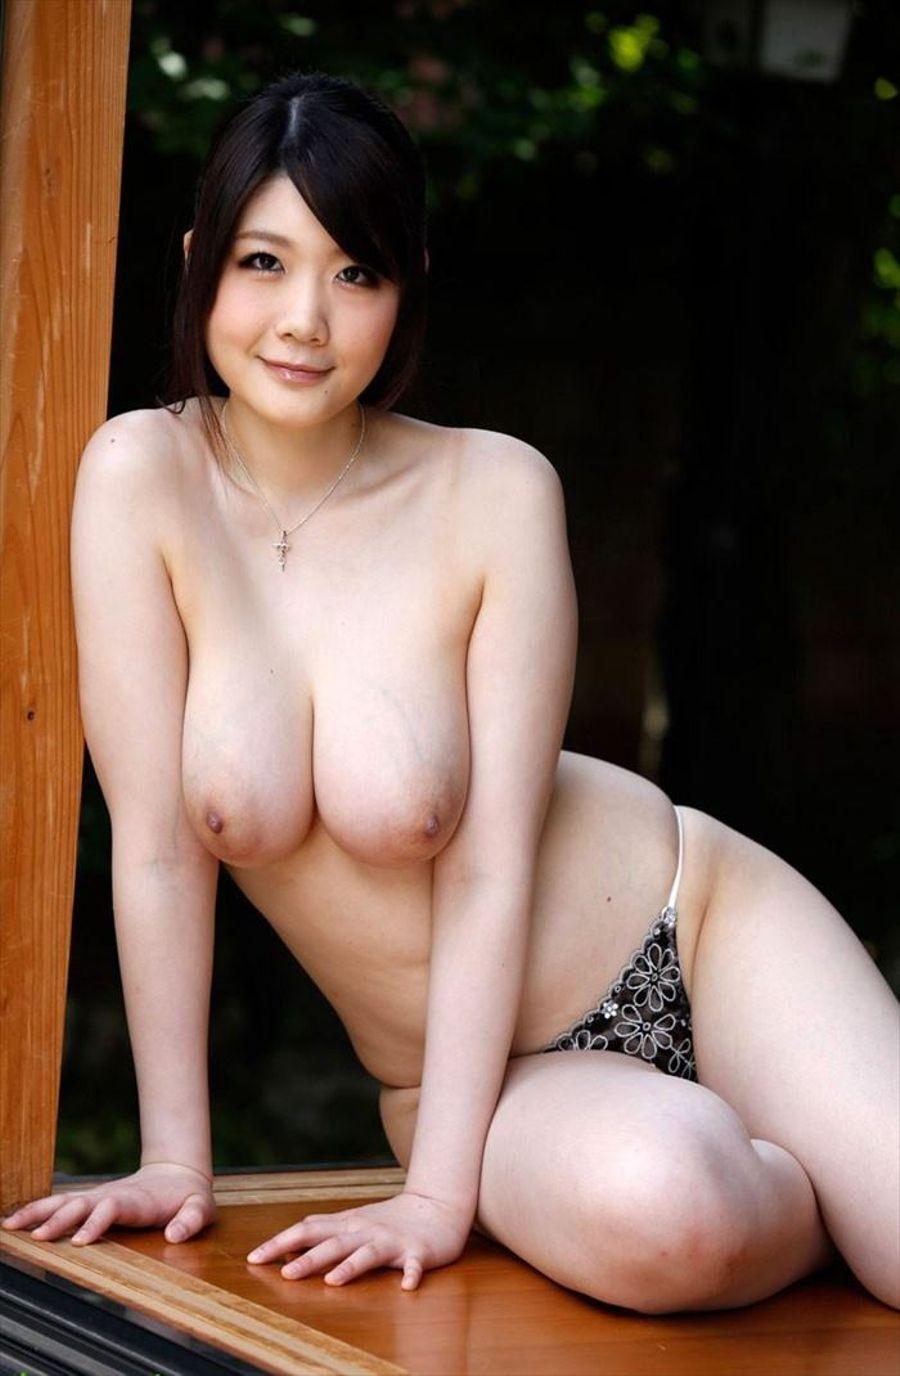 Naked Girls 18+ Bbw doggy style tumblr